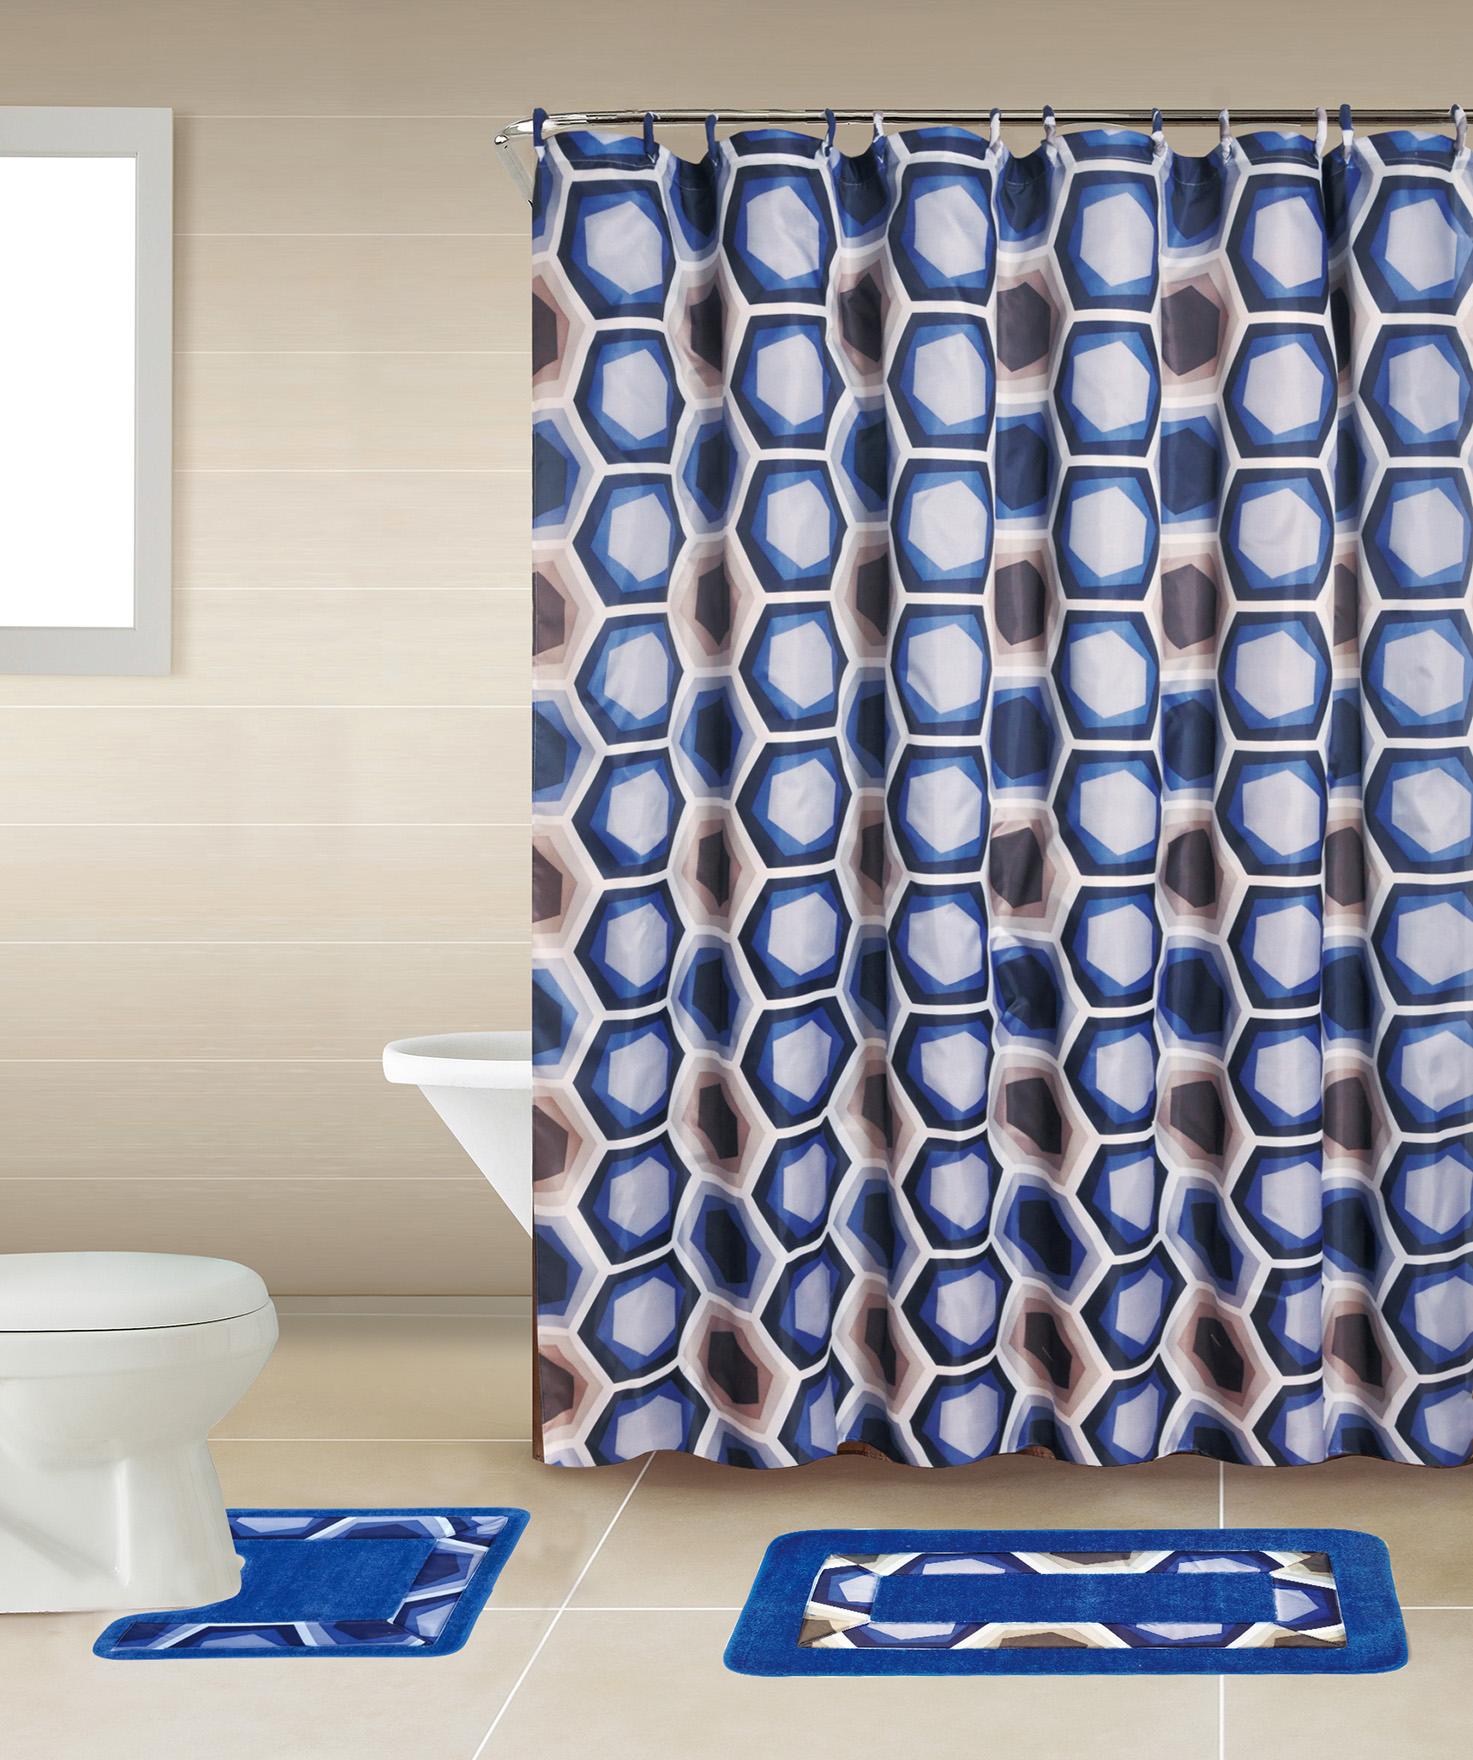 18 Piece Modern Shower Curtain Set Includes